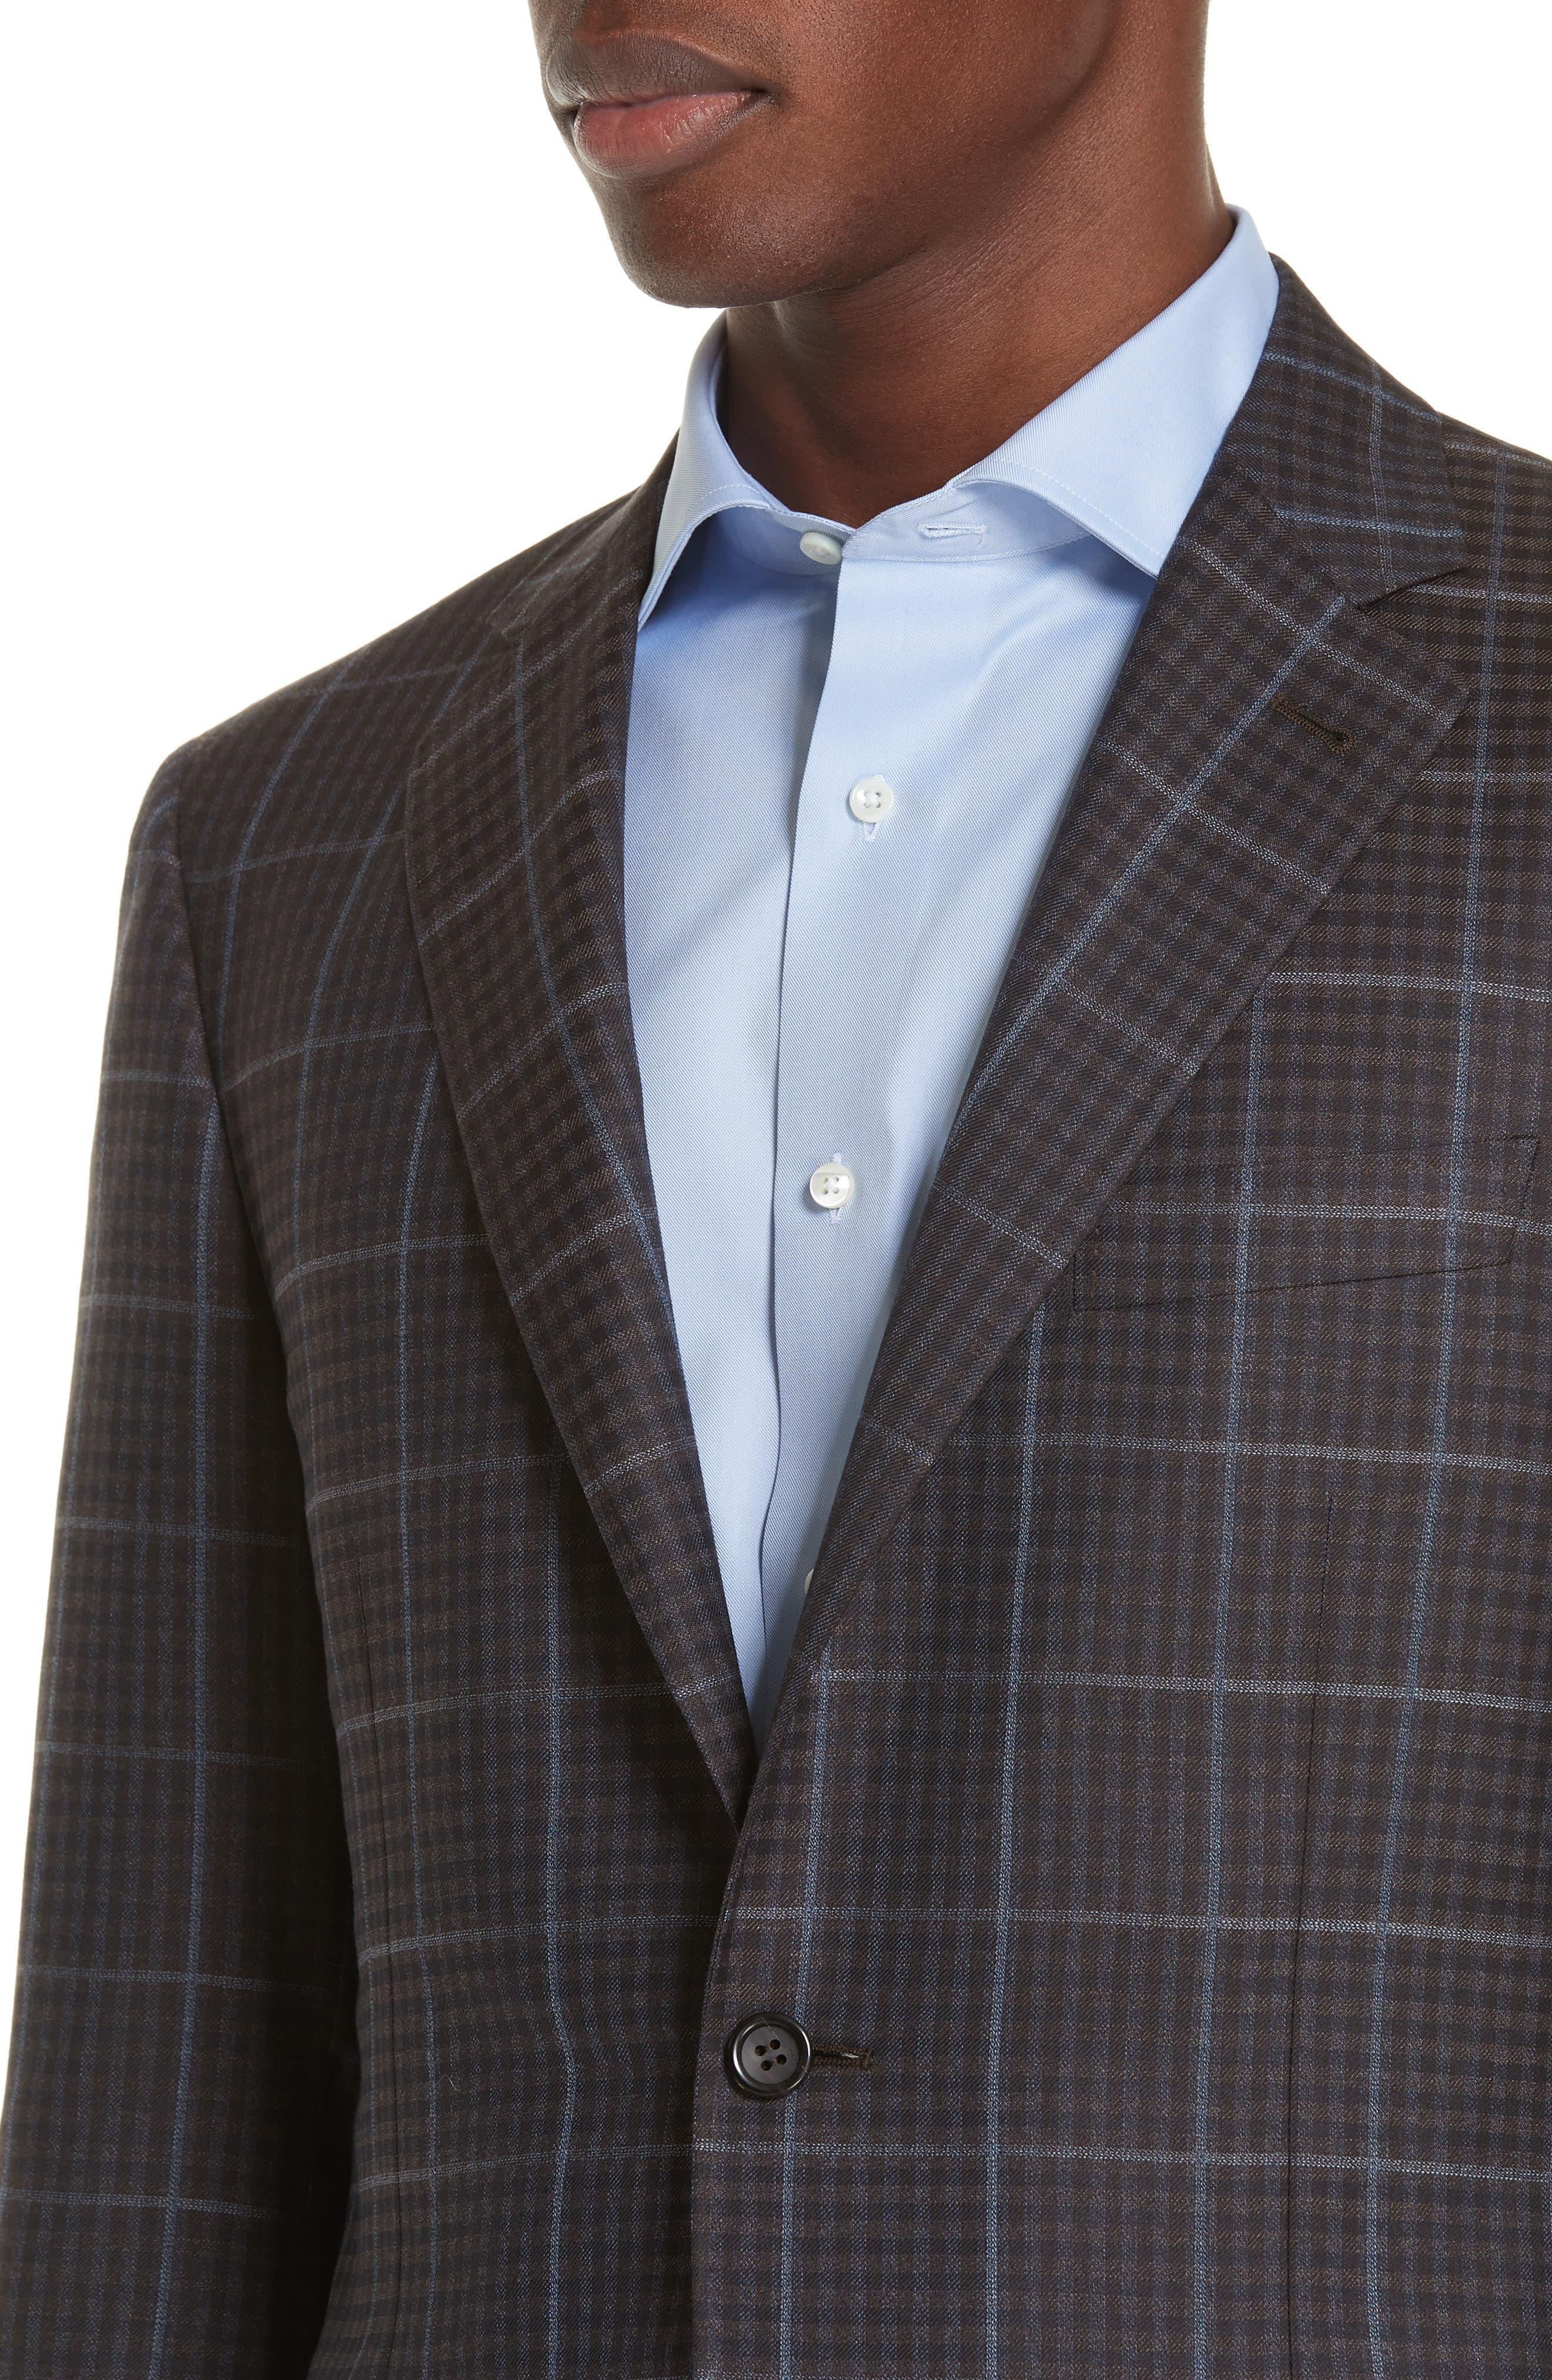 Classic Fit Plaid Wool Sport Coat,                             Alternate thumbnail 4, color,                             BROWN